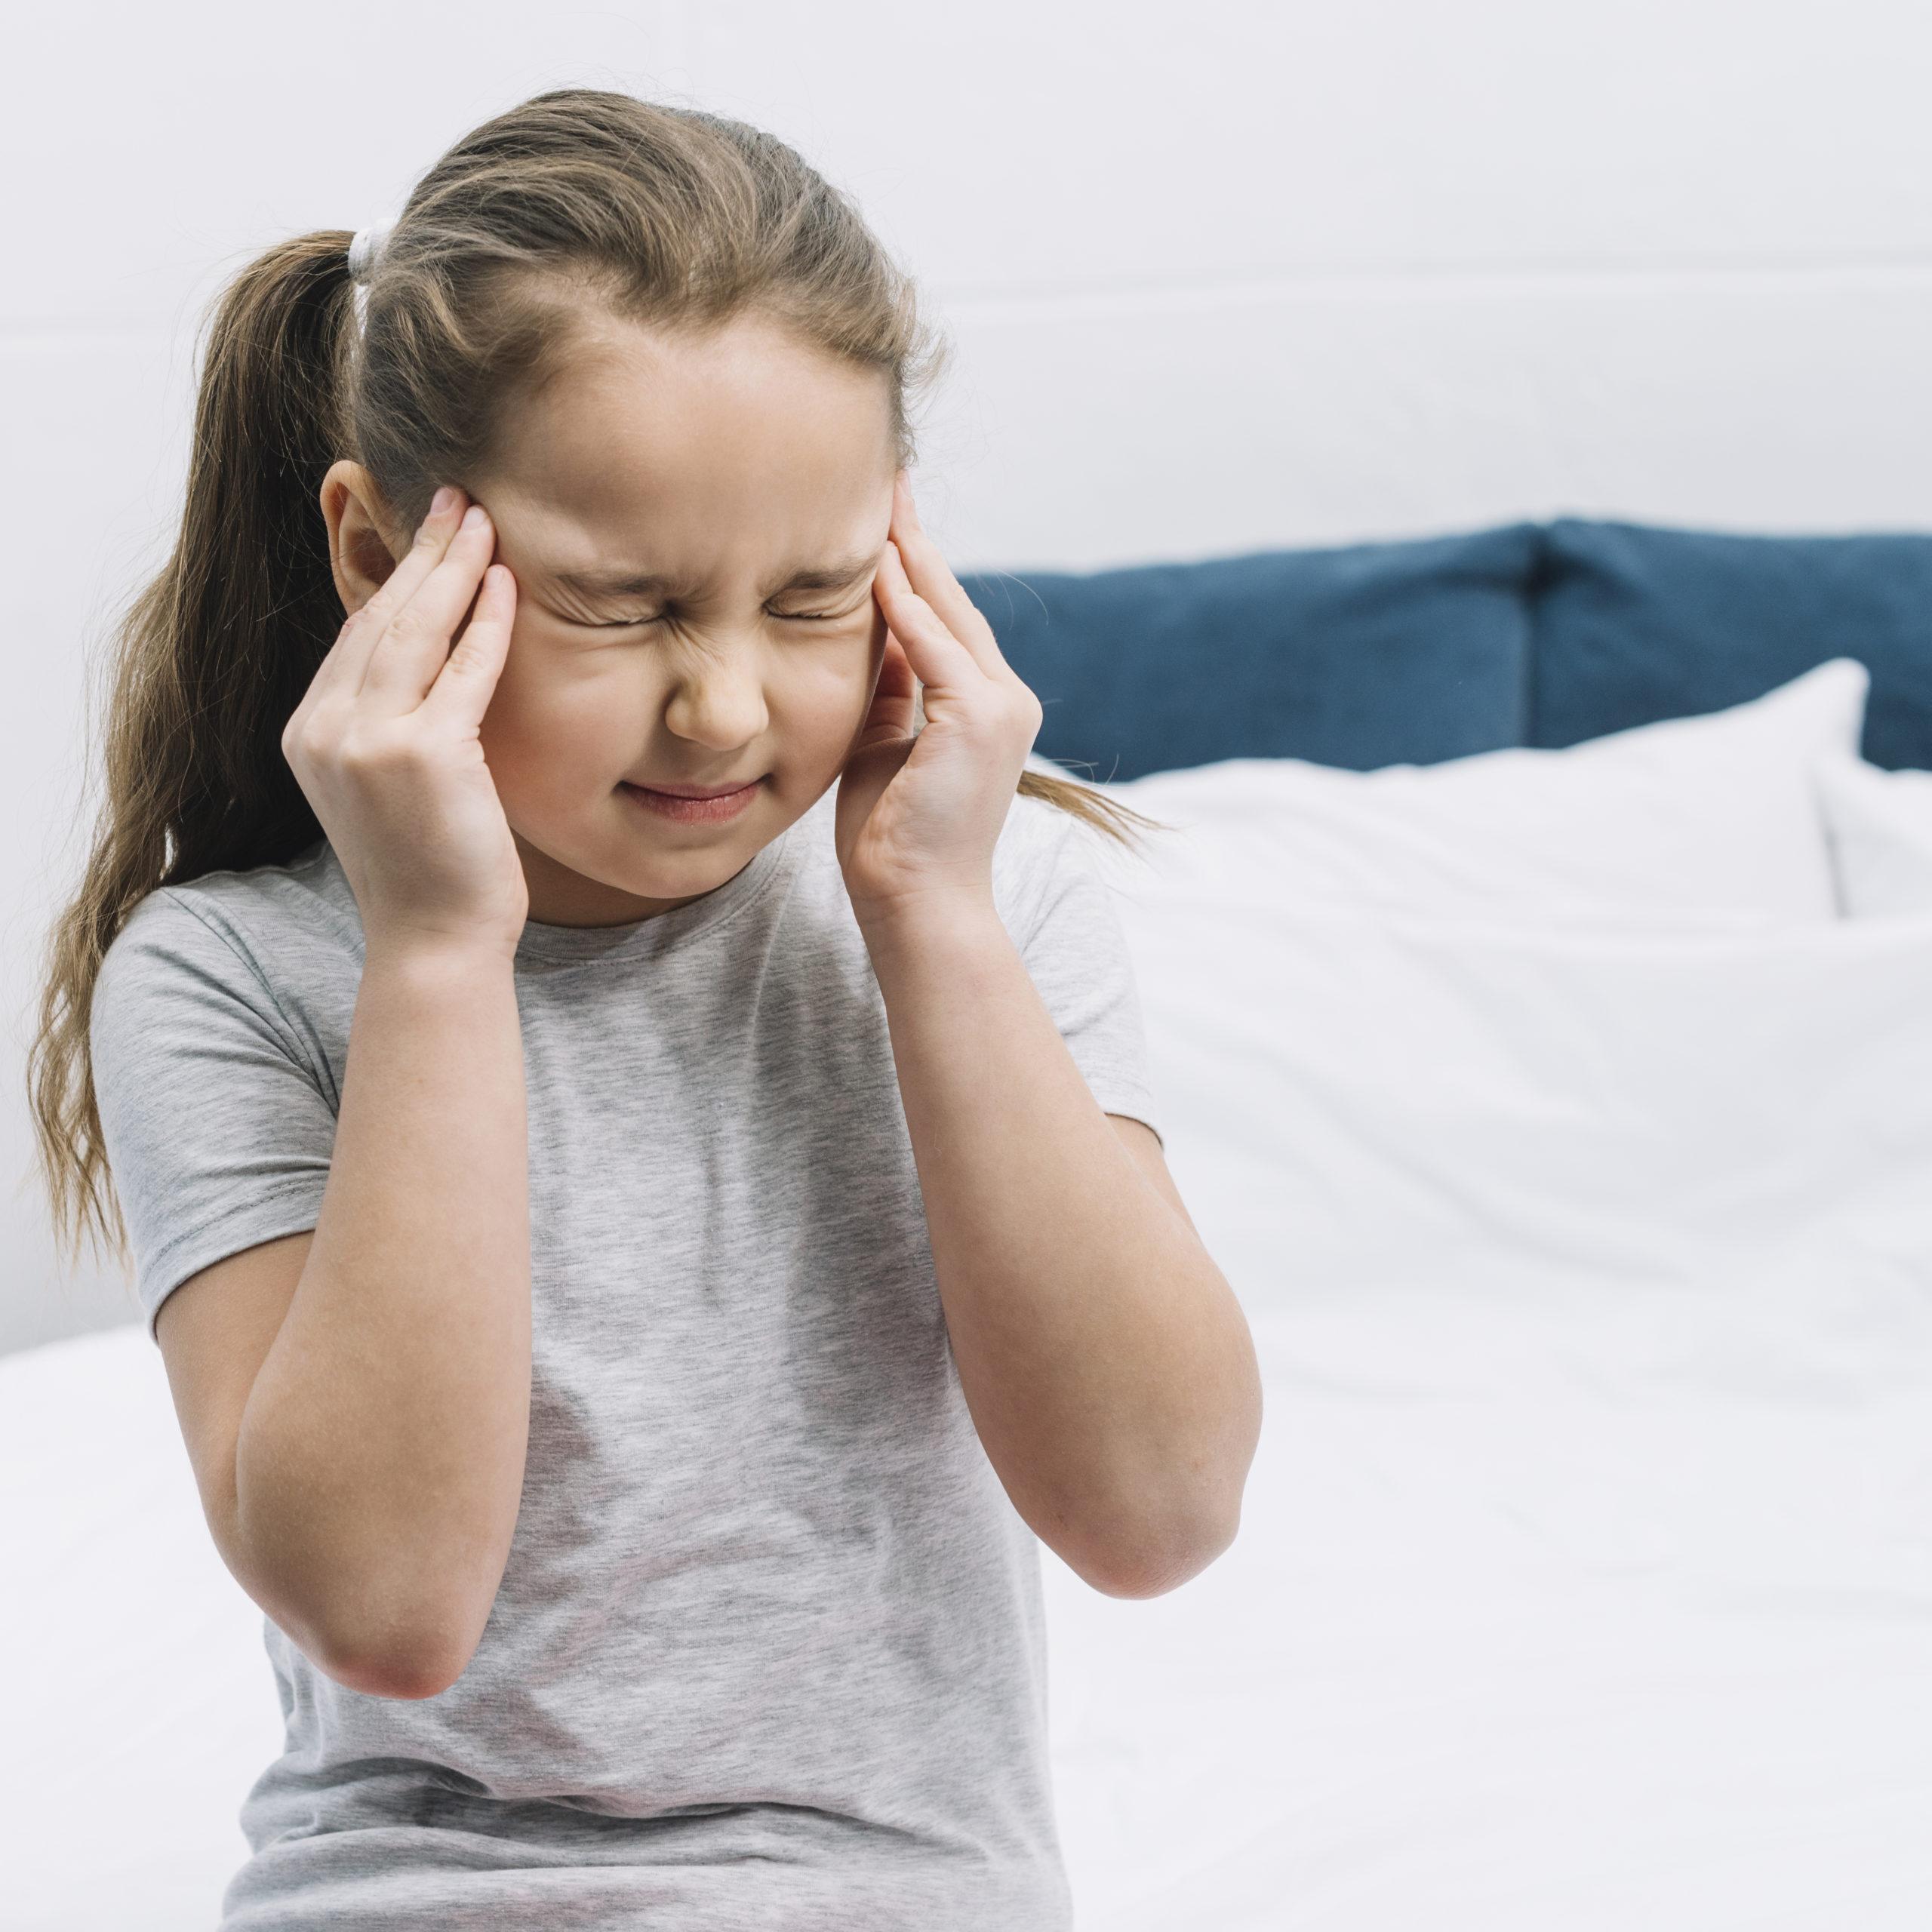 Meningitis – Myths and Misconceptions